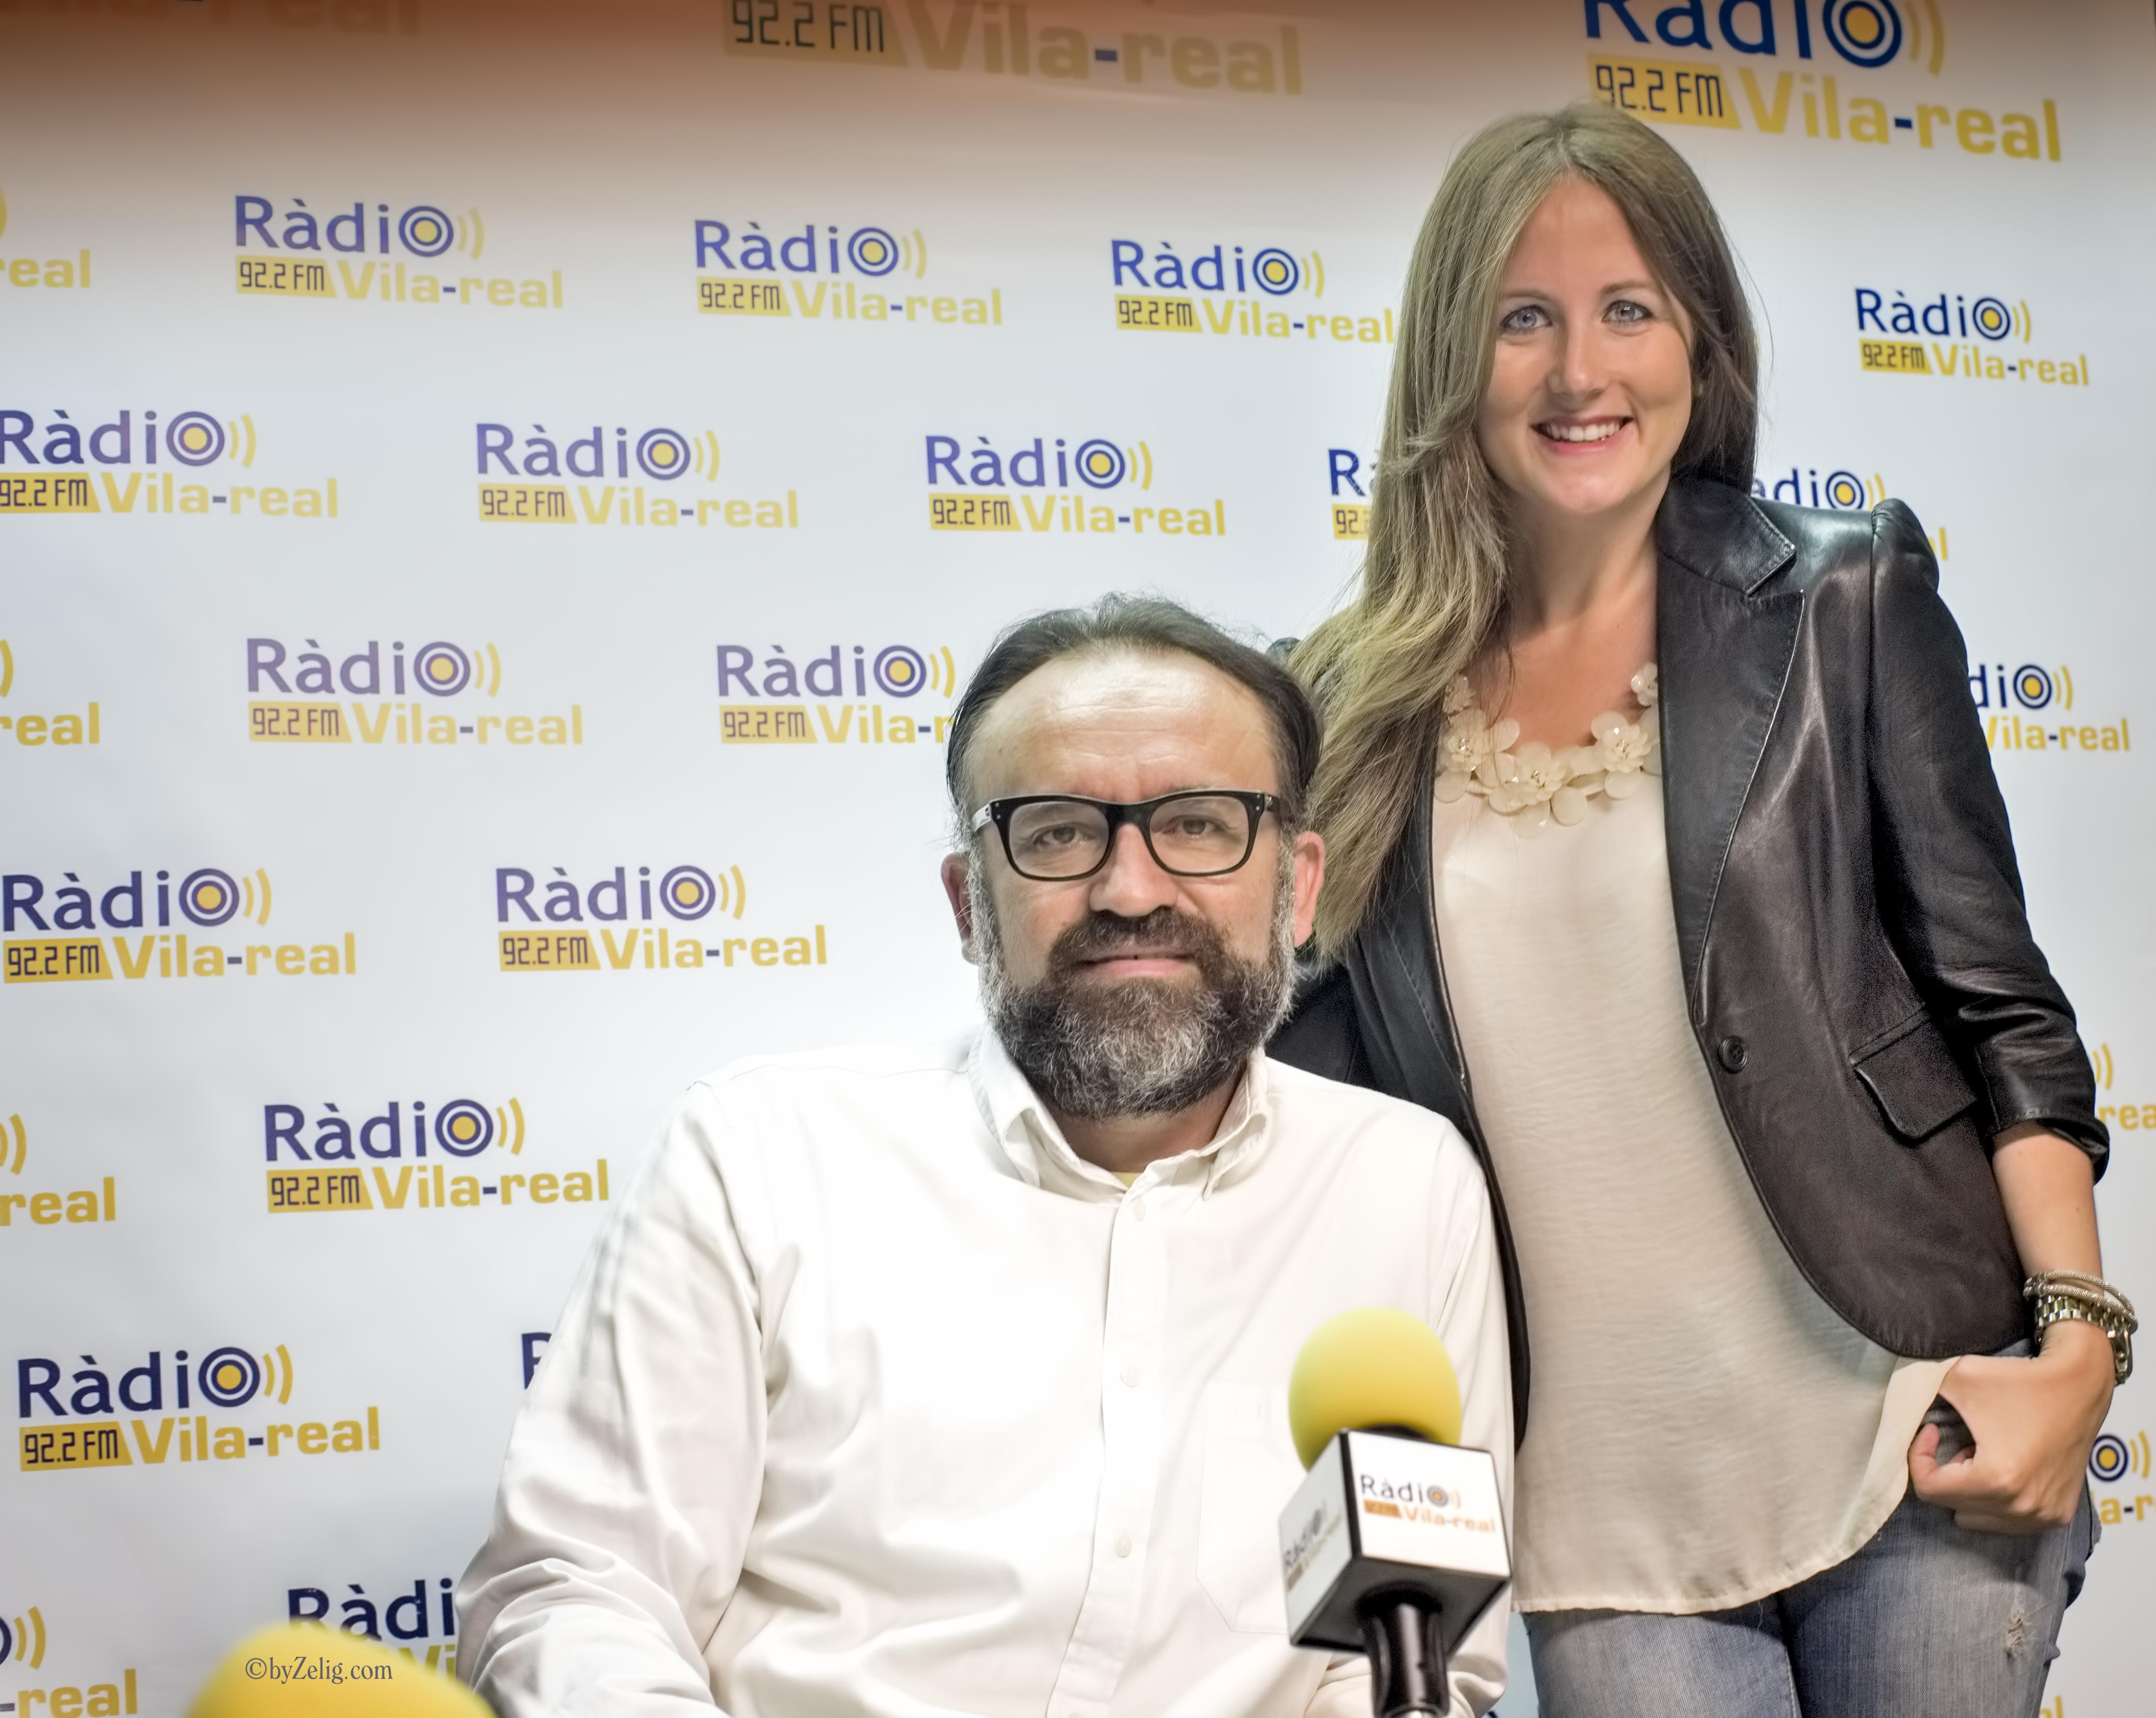 Esports Radio Vila-real. Programa del 28 de febrero de 2017